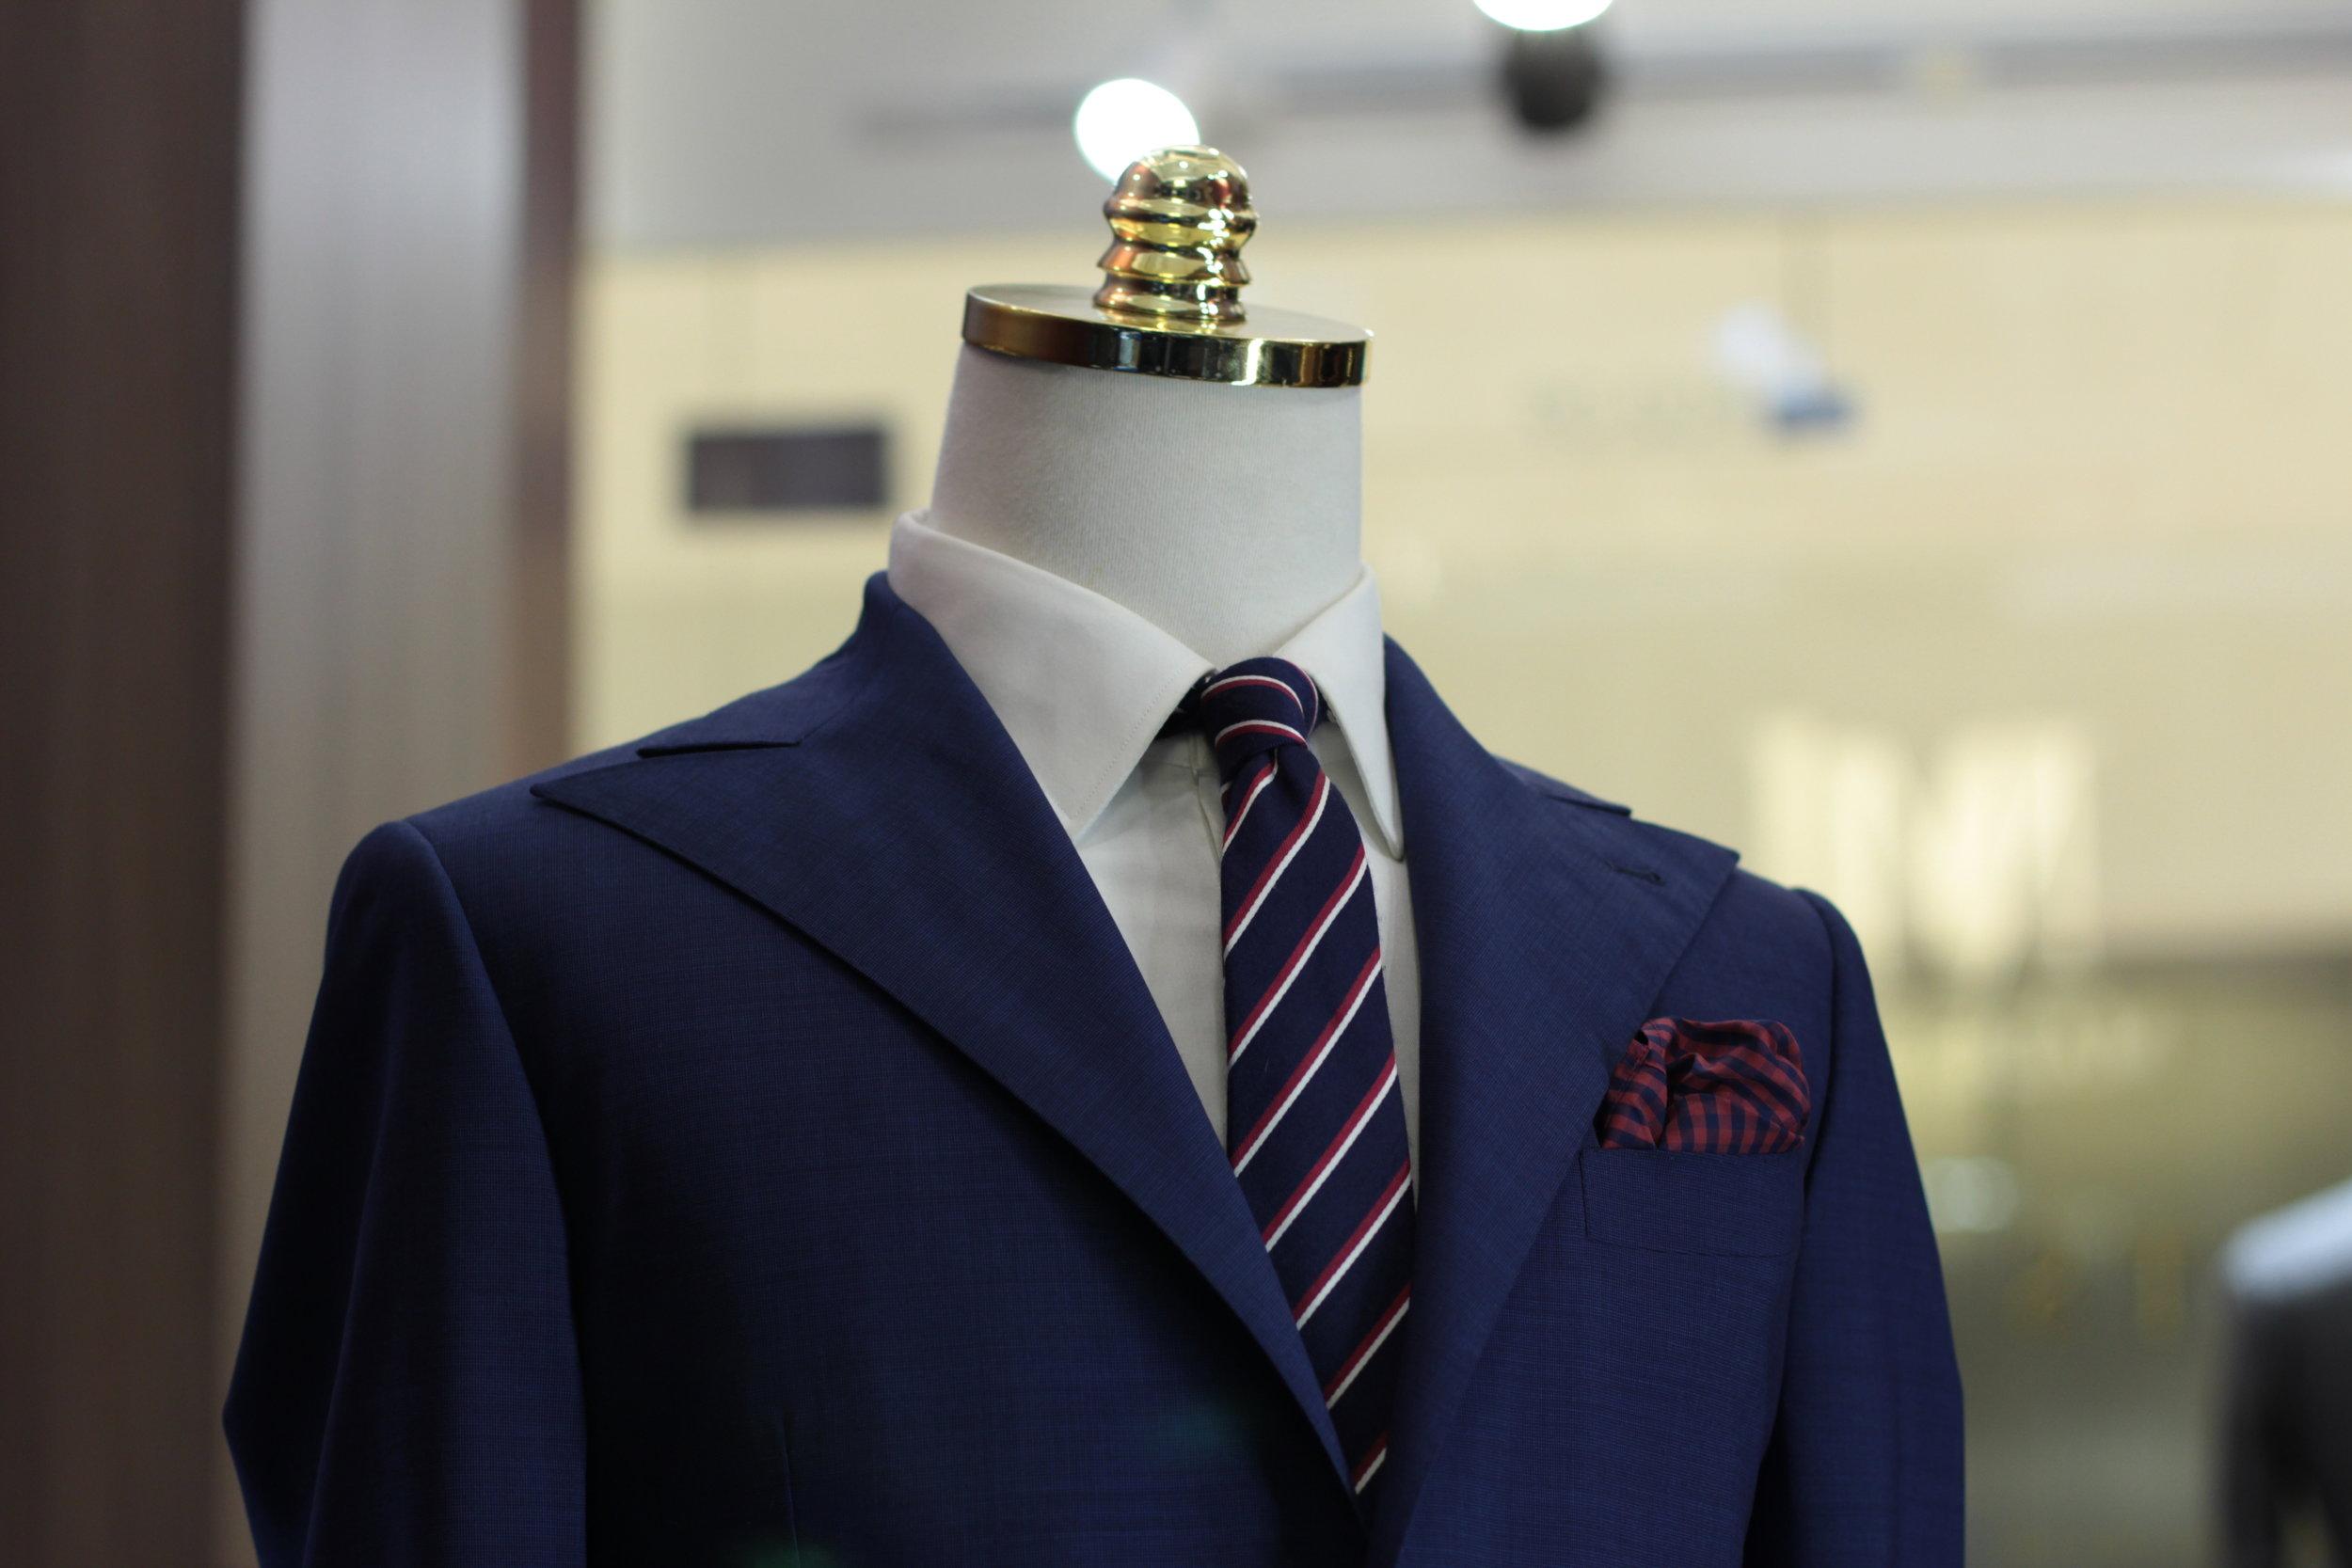 Made Suits Blue Sparrow Peak Lapel Suit Herringbone Black Suit Made to Measure Suits.JPG